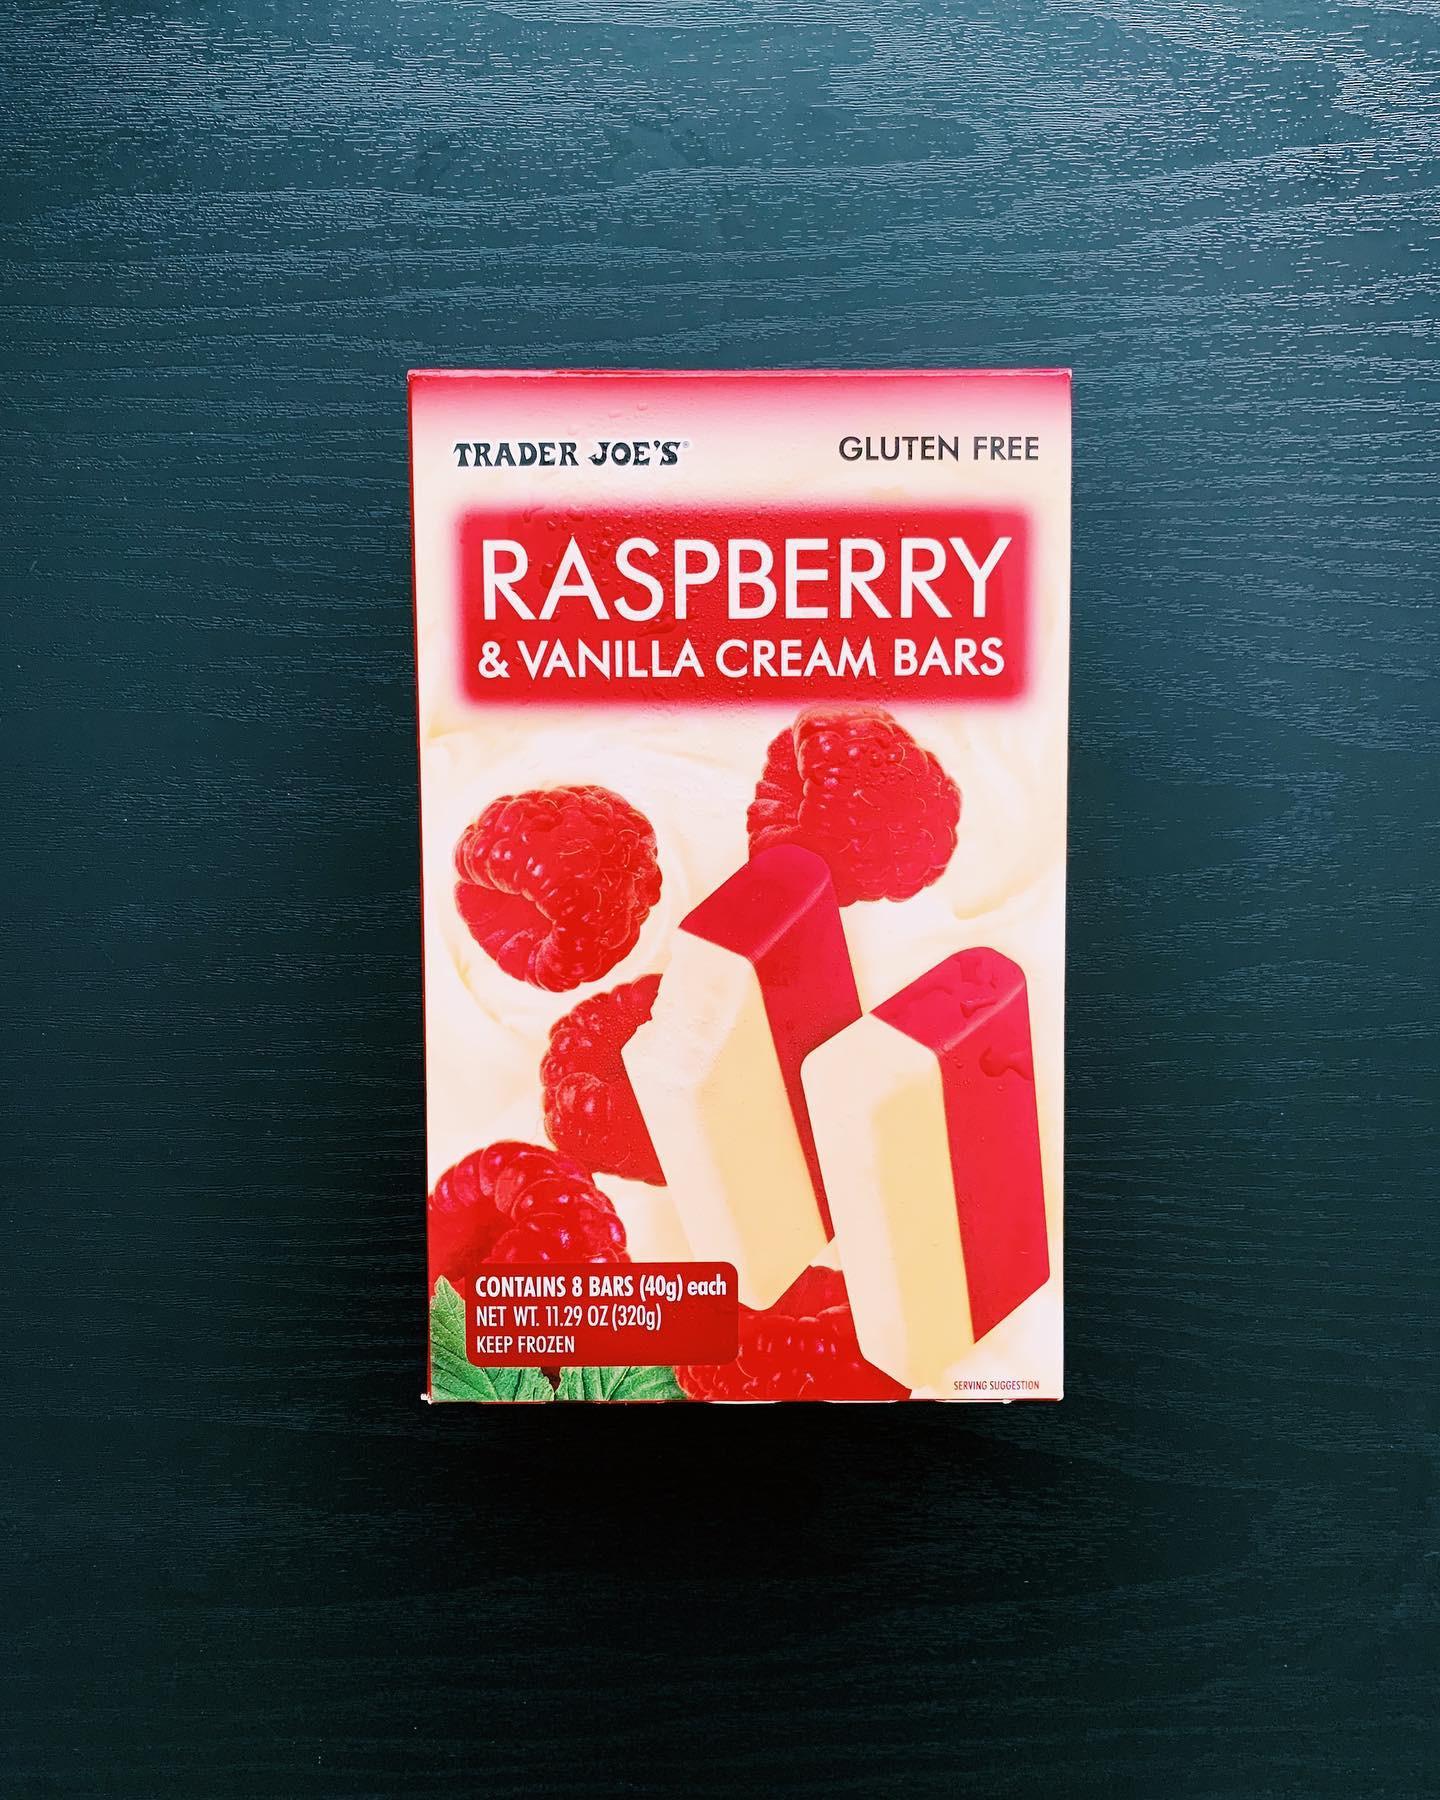 Raspberry & Vanilla Cream Bars